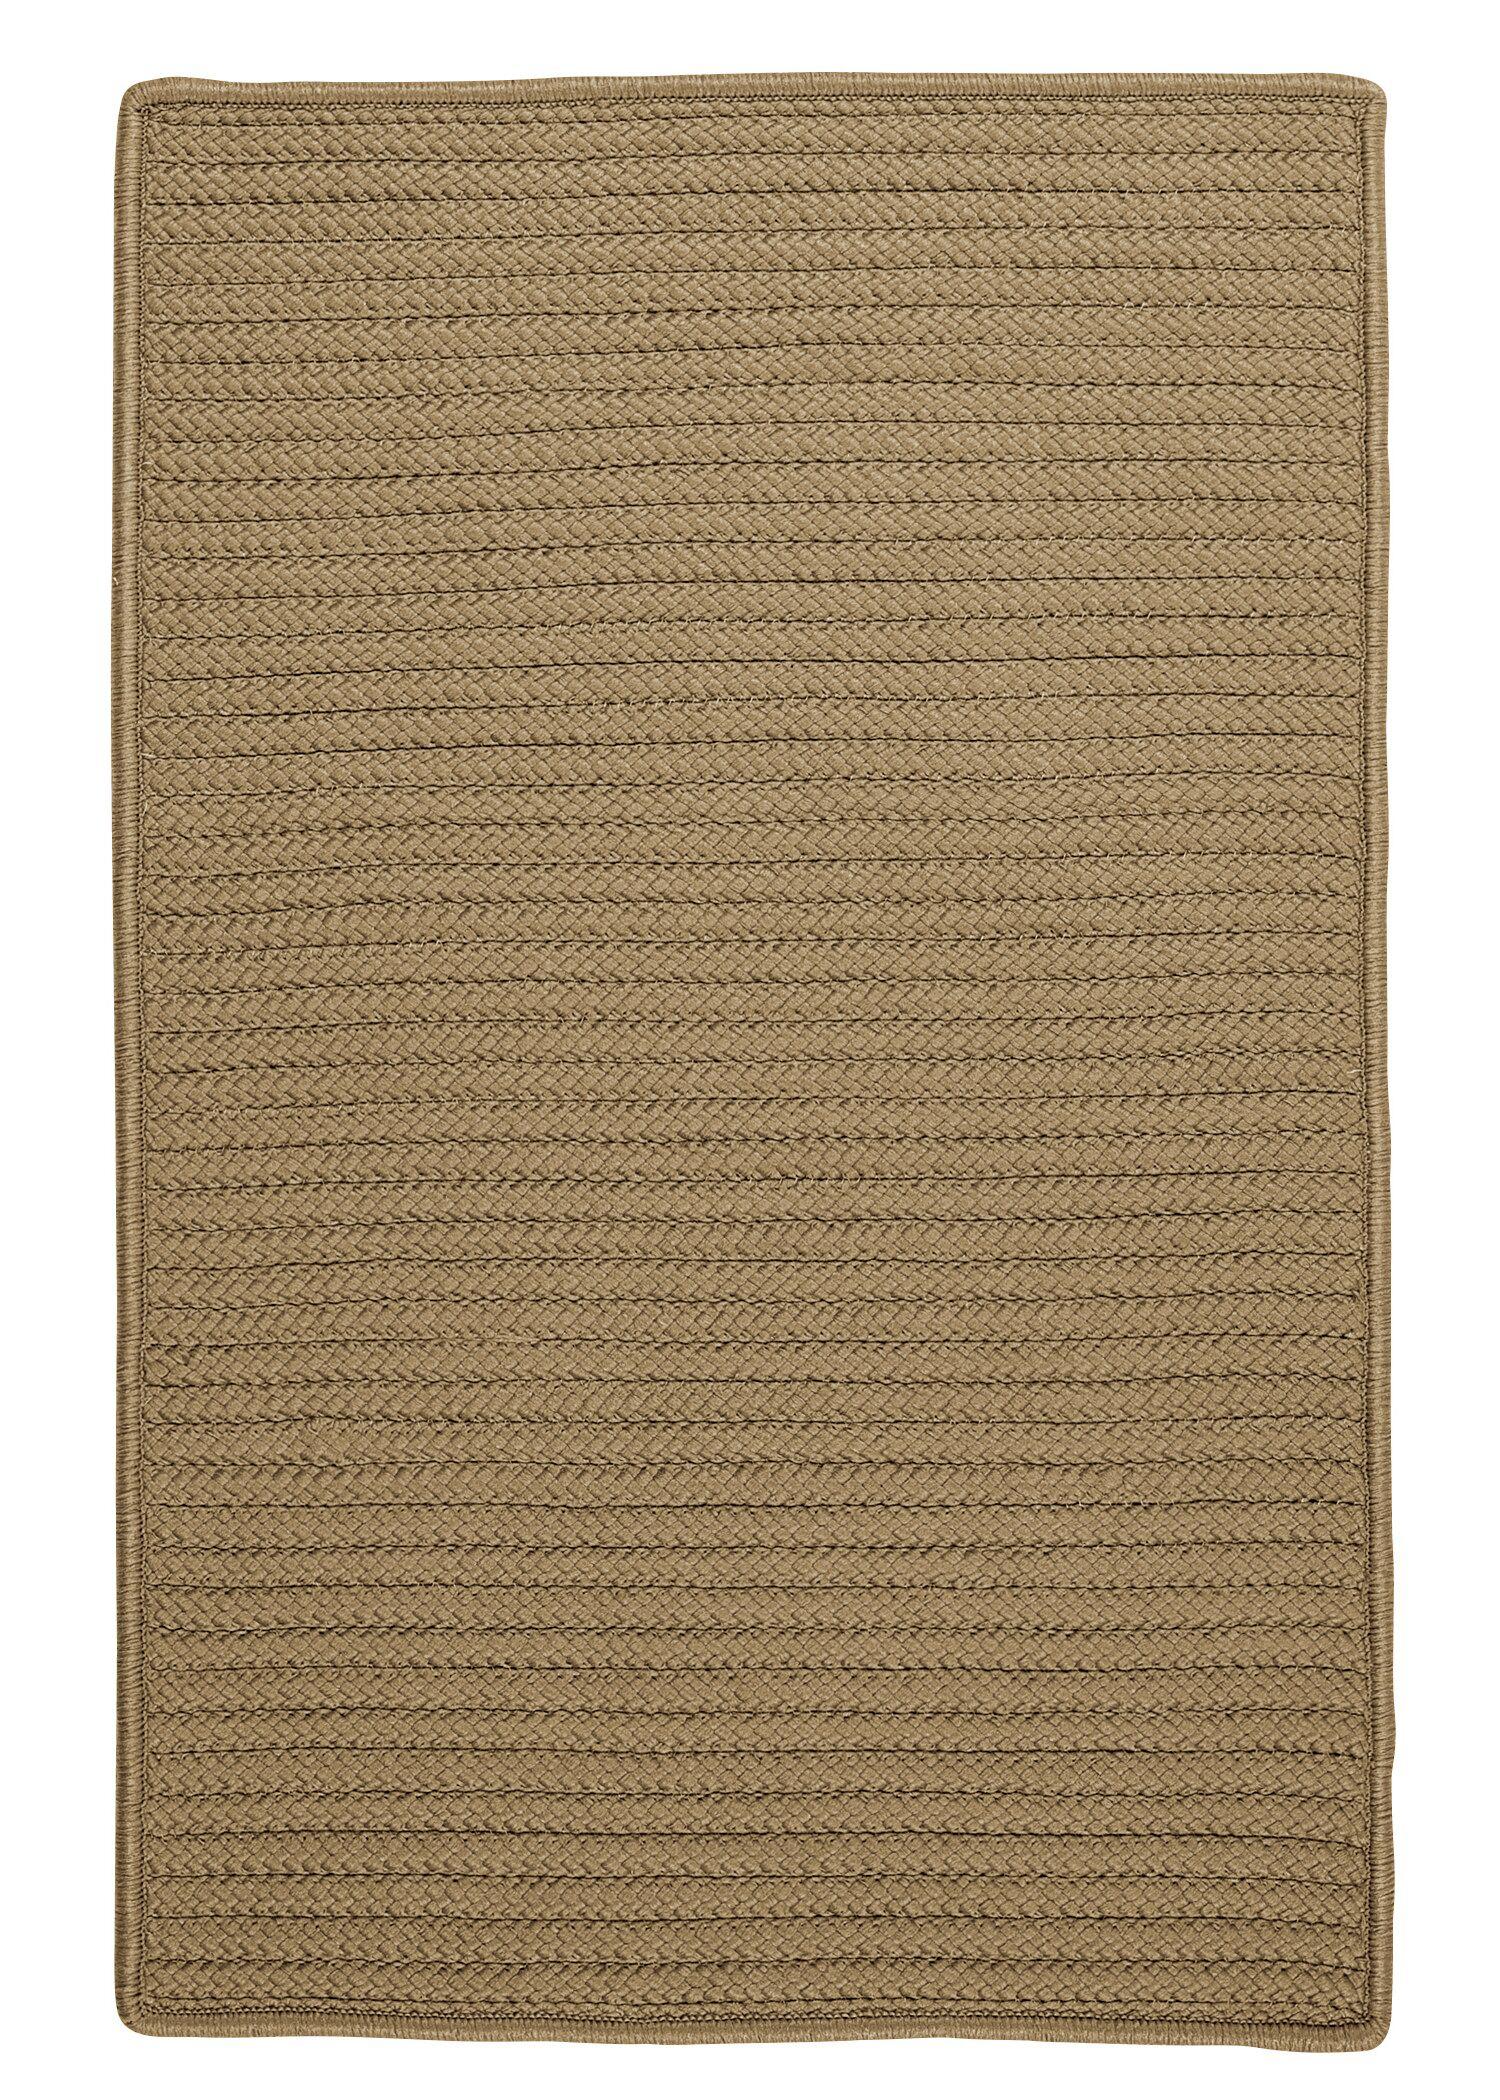 Glasgow Brown Indoor/Outdoor Area Rug Rug Size: Rectangle 5' x 8'